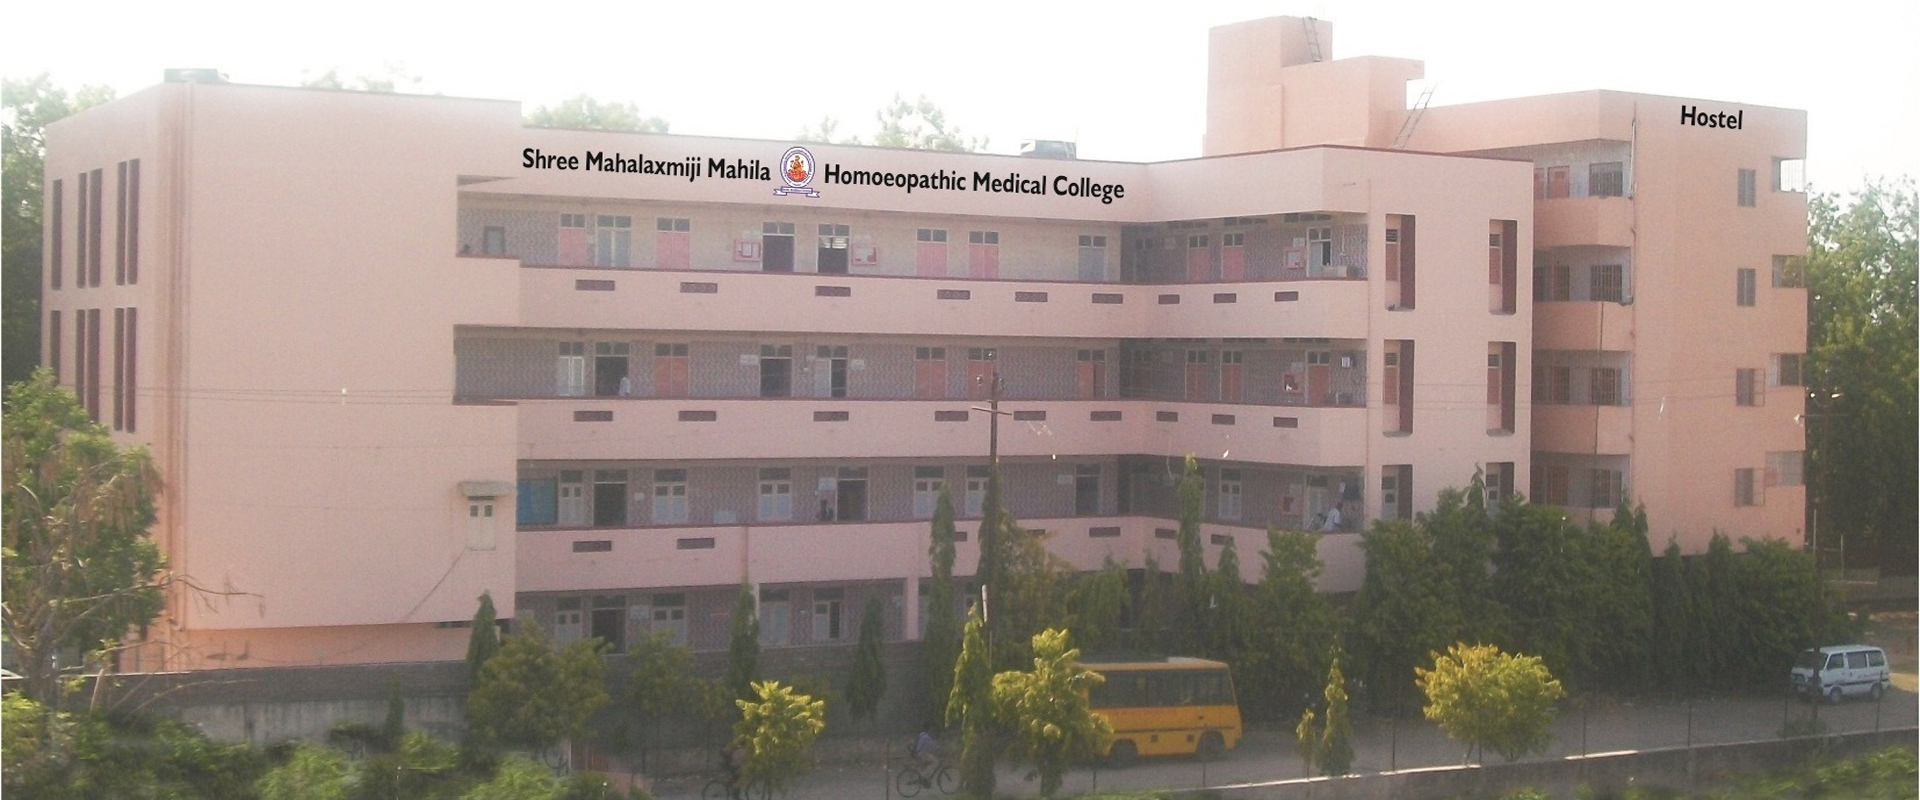 Shri Mahalaxmi Mahila Homoeopathic Medical College, Vadodara Image